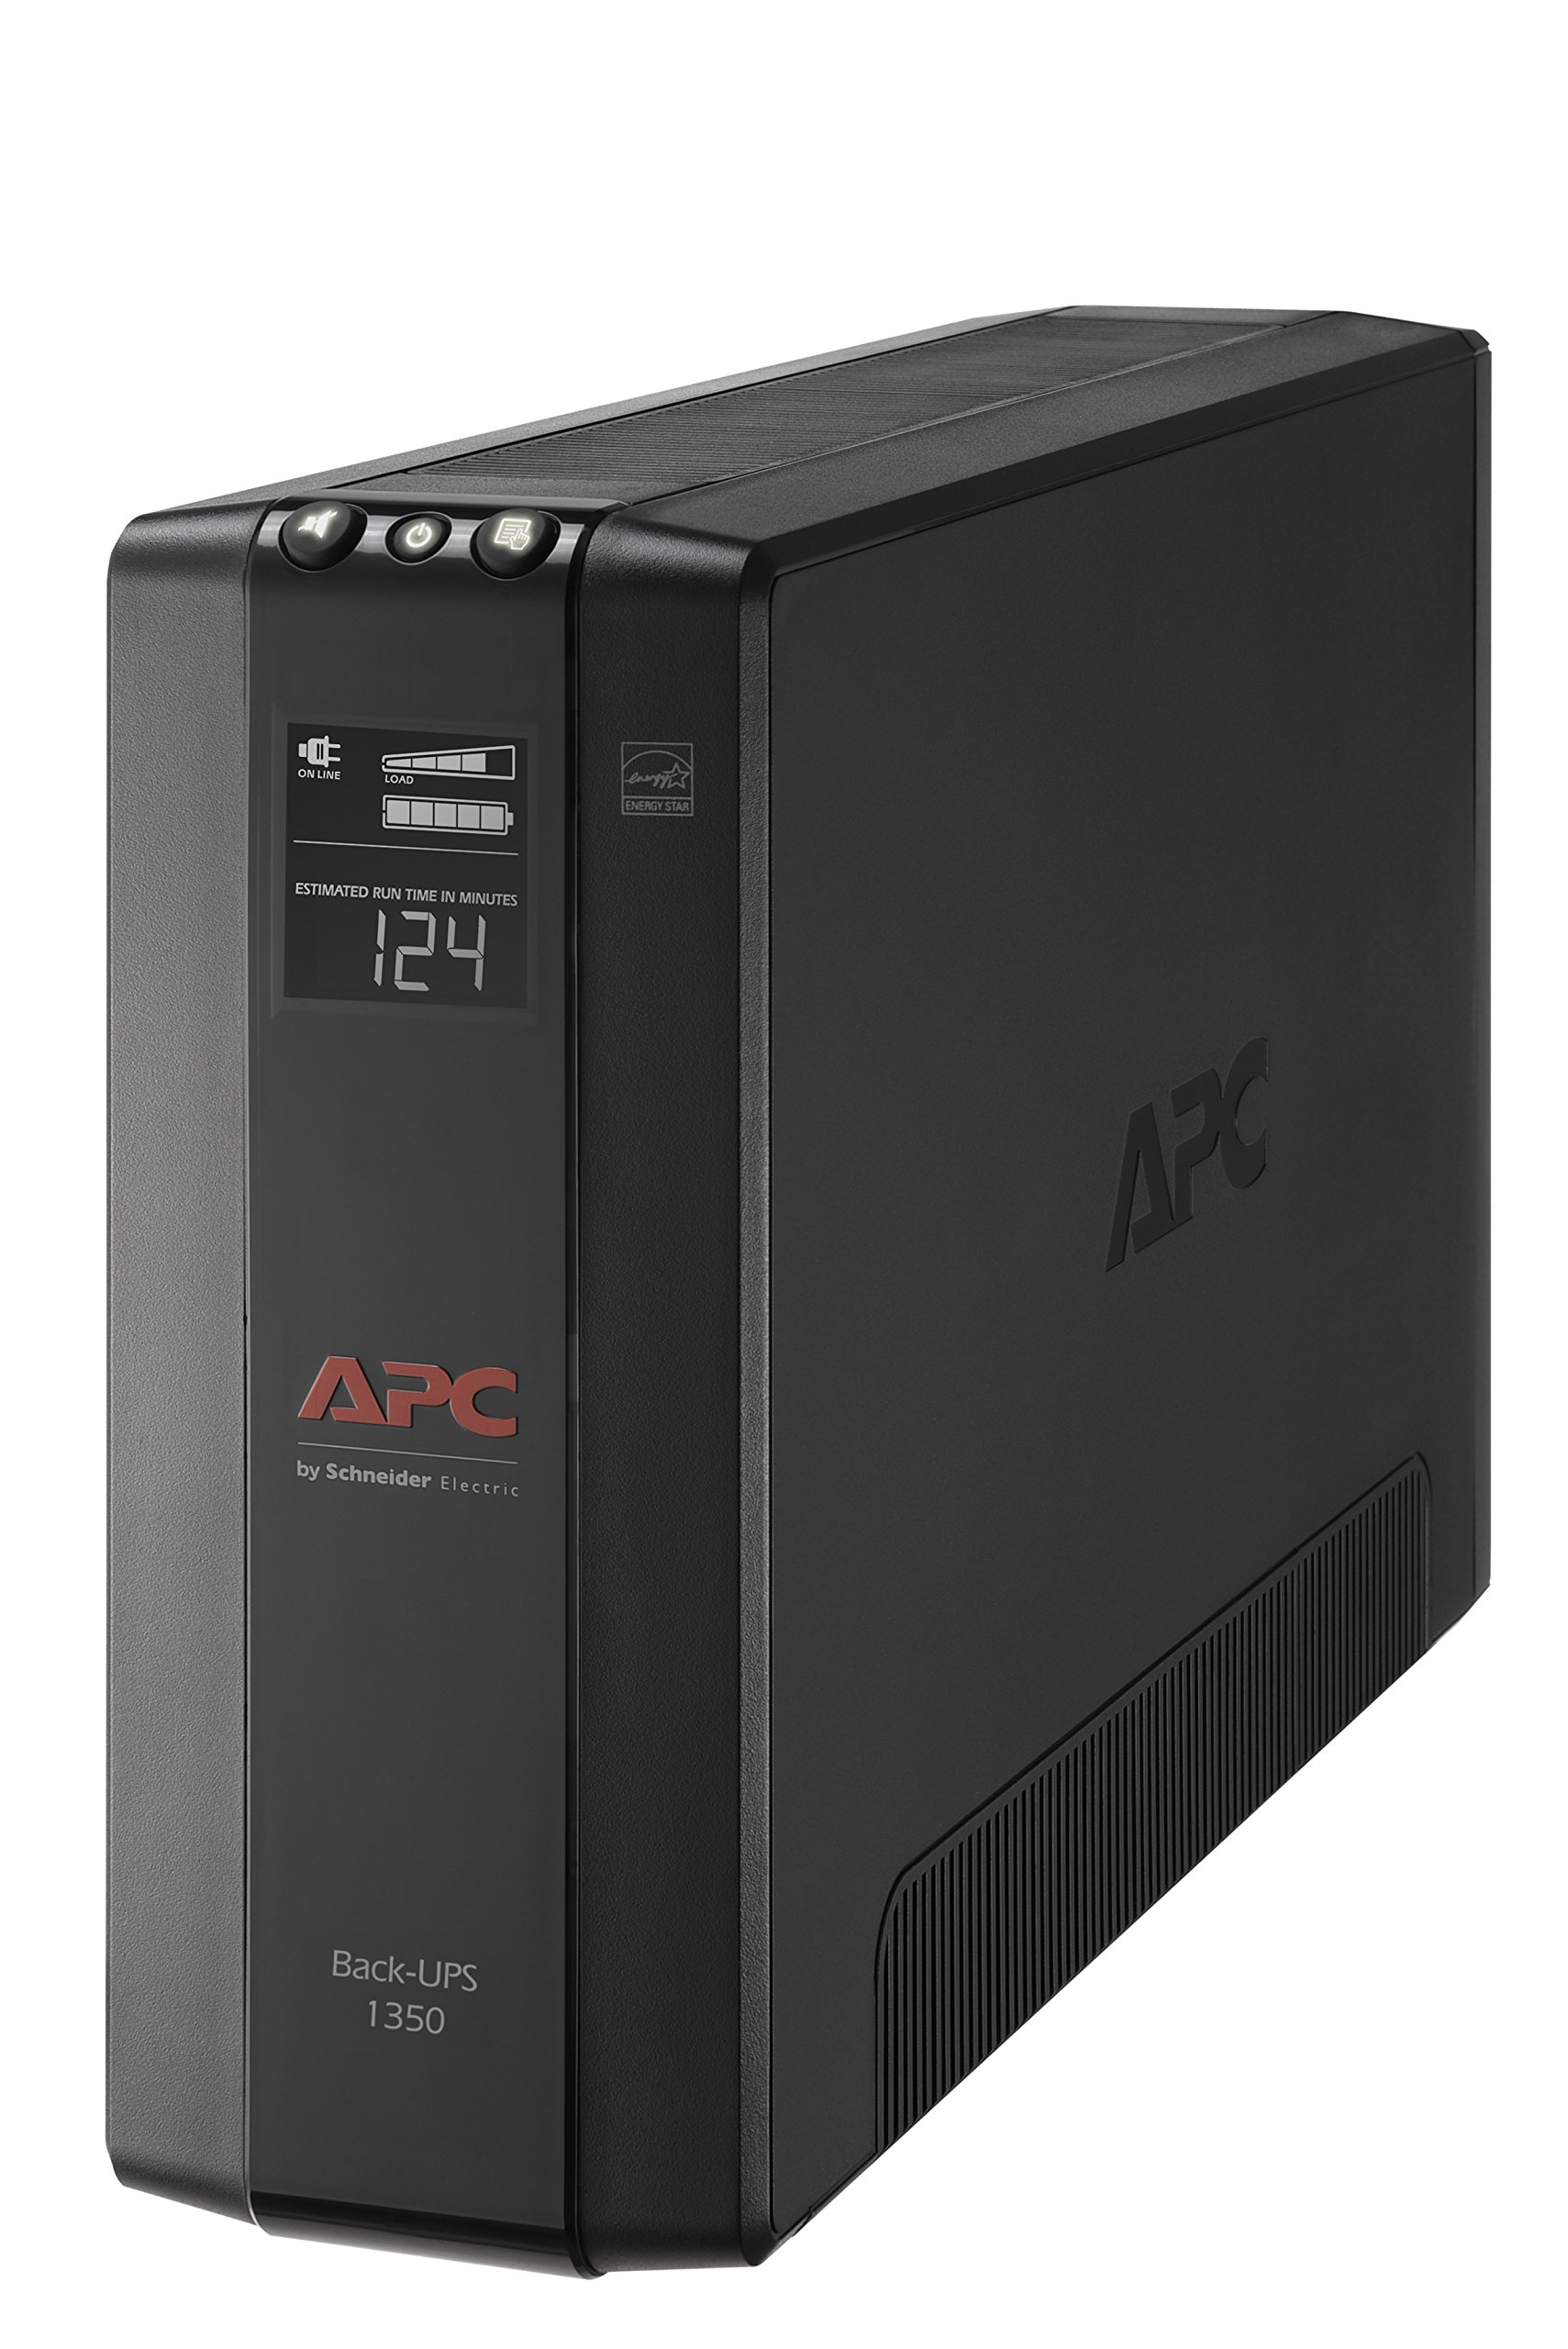 APC 1350VA Compact UPS Battery Backup & Surge Protector, Back-UPS Pro (BX1350M)